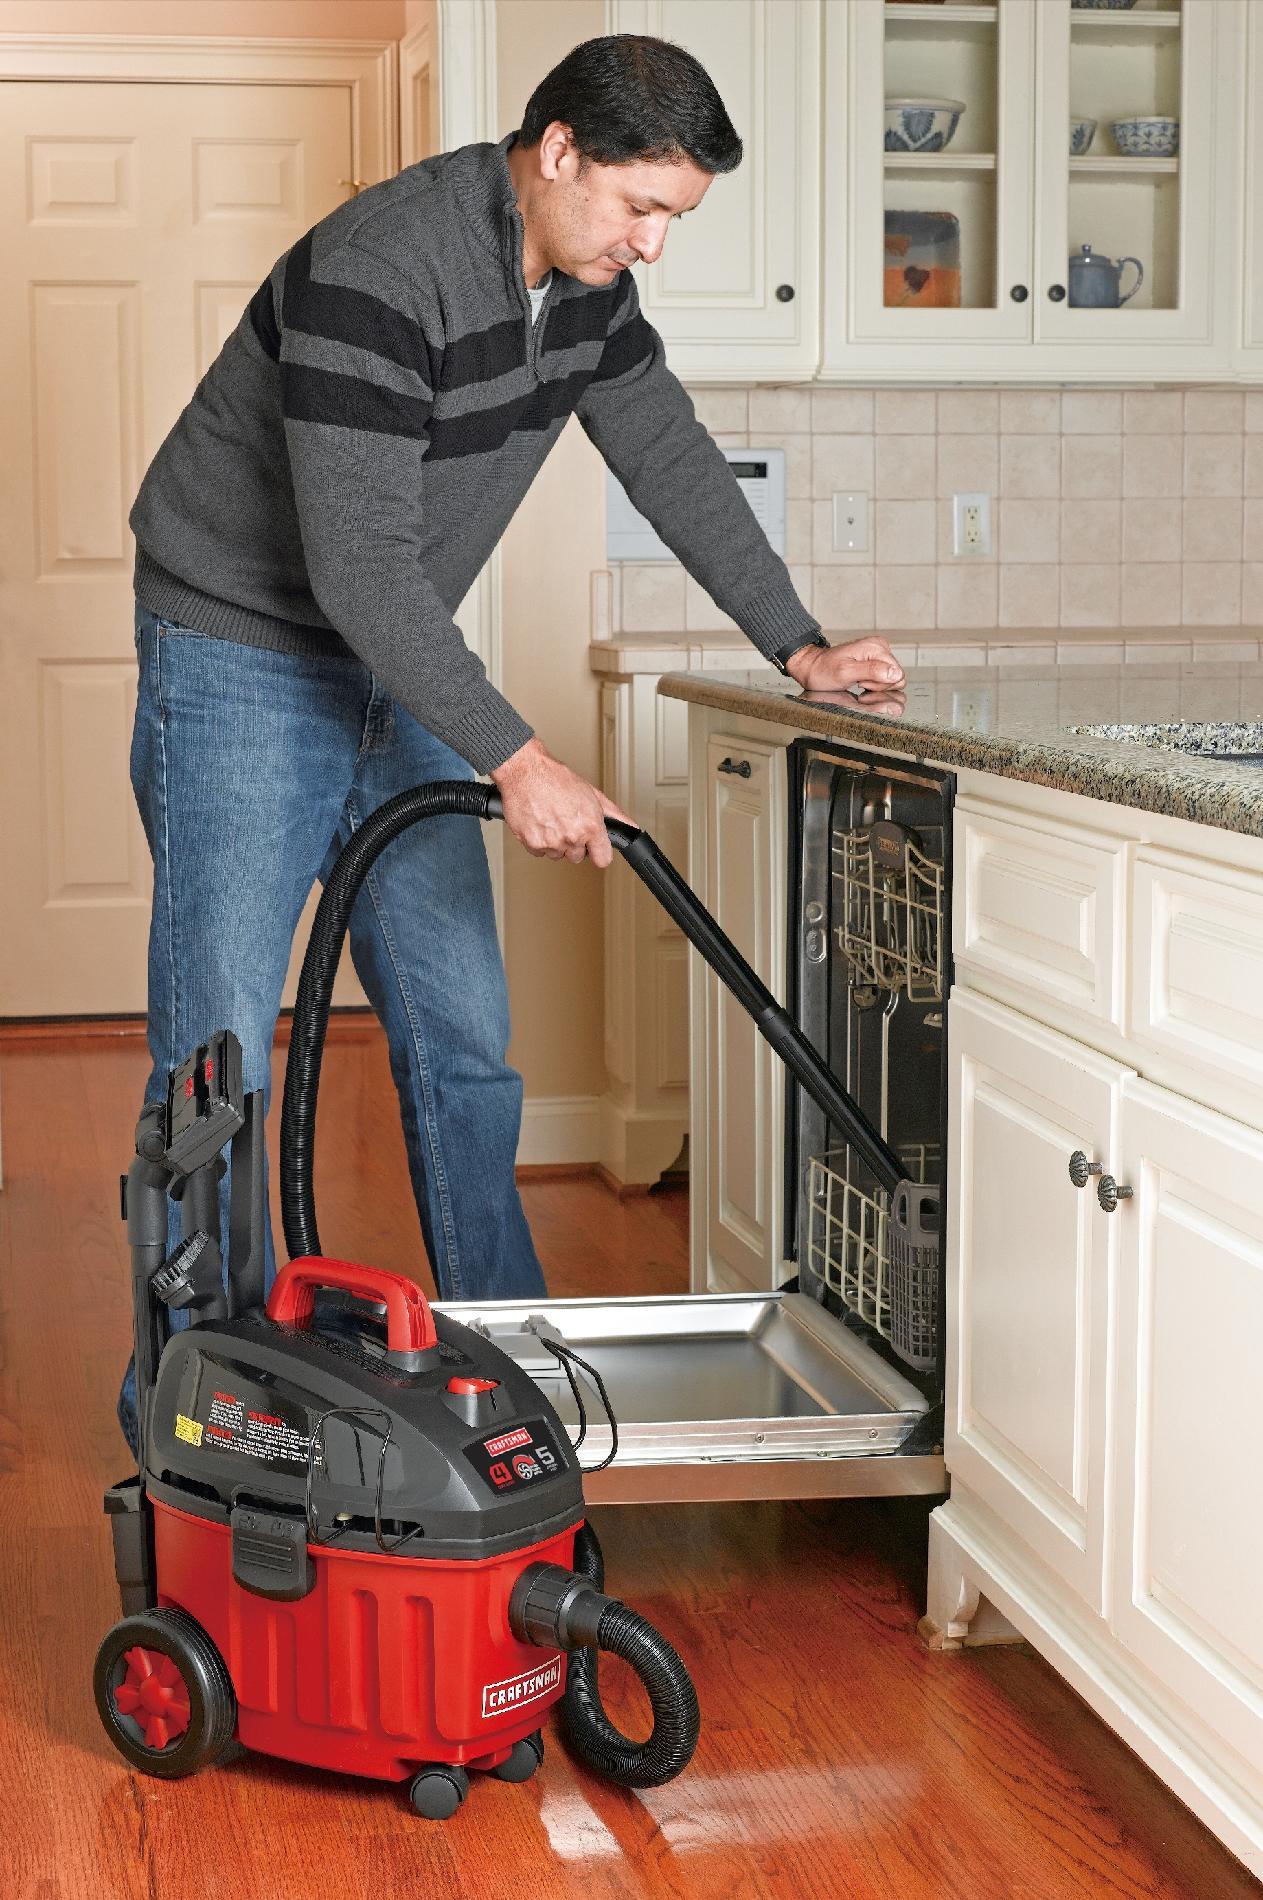 Craftsman Ultra-Quiet 4 Gallon 5 Peak HP Portable Household Wet-Dry Vac